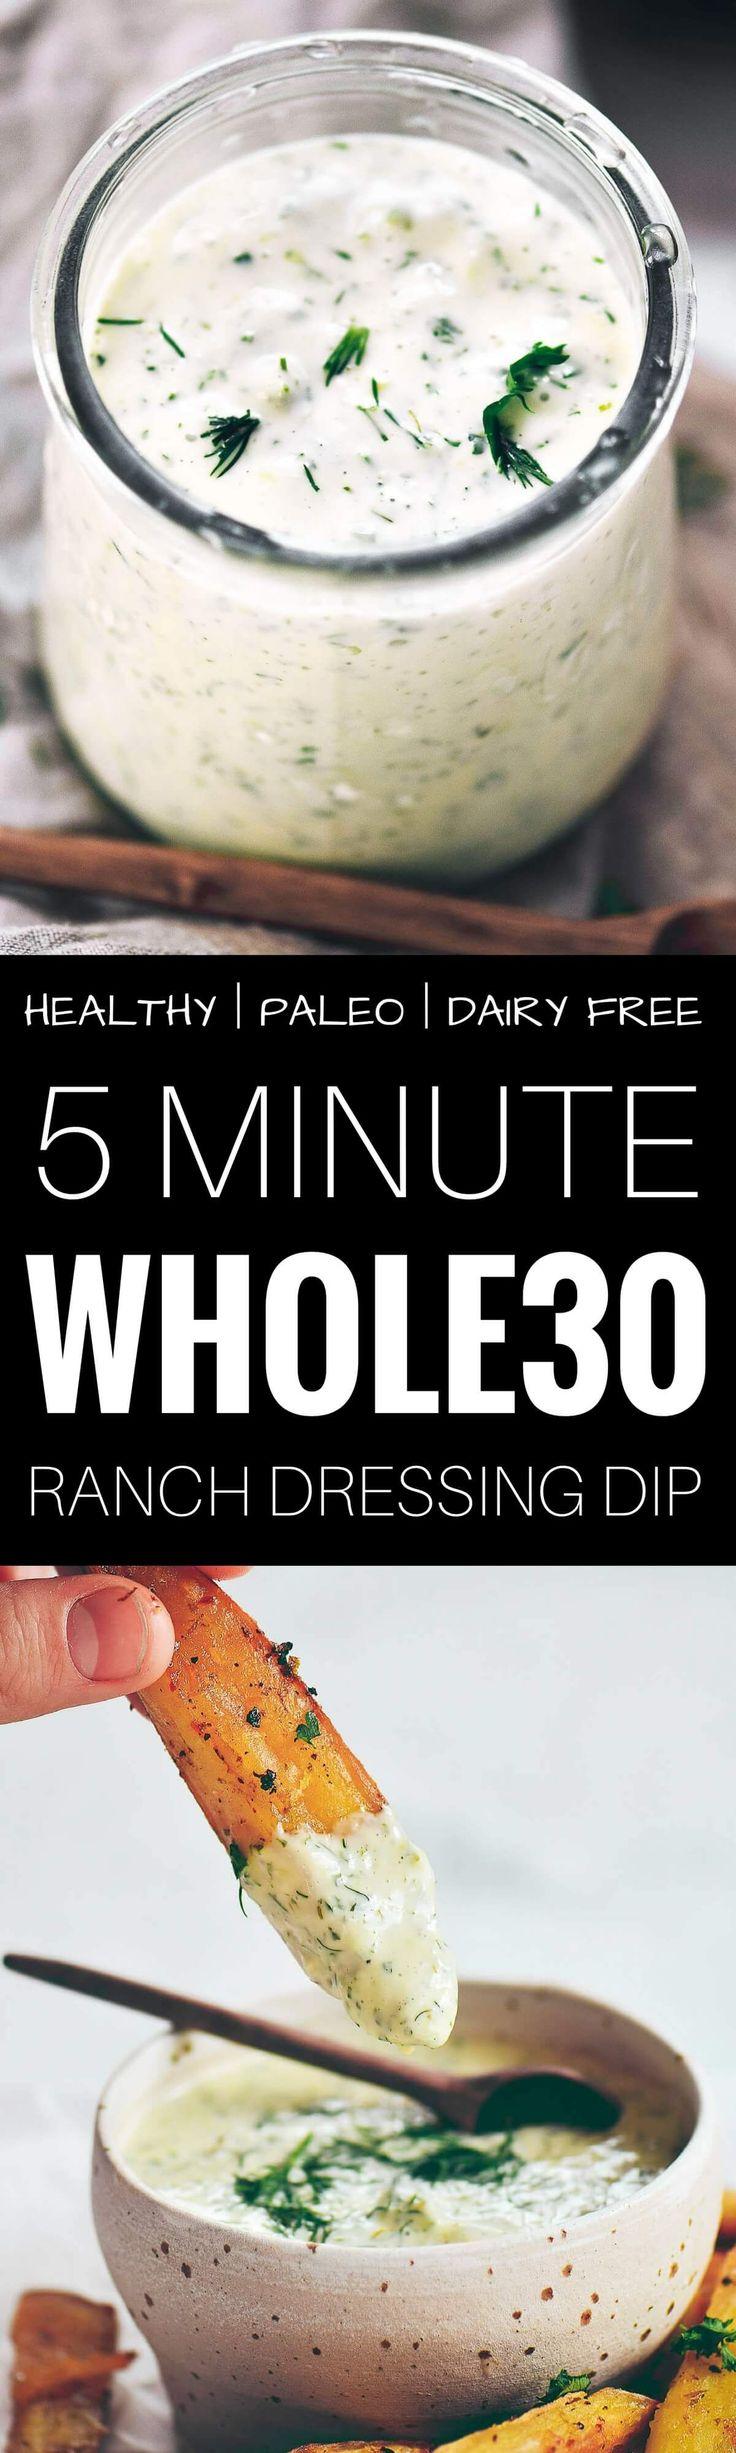 Creamy whole30 ranch dressing dip. Sub vegan mayo